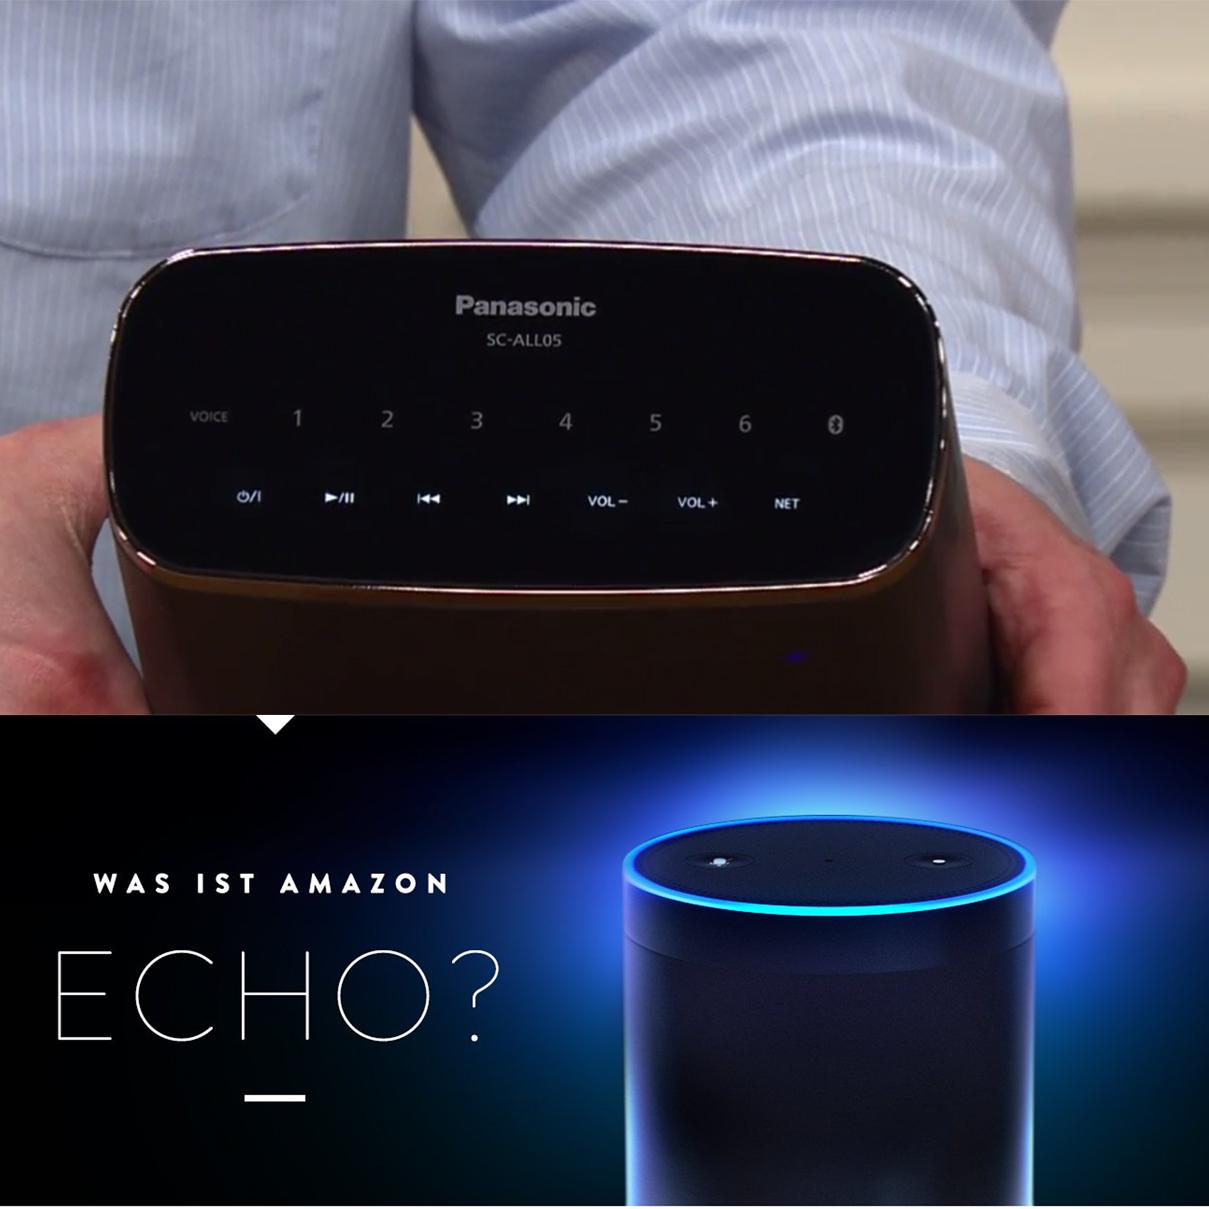 Panasonic wasserfester WLAN Bluetooth (Multiroom) Lautsprecher mit Akku oder Amazon Echo zum Bestpreis @QVC